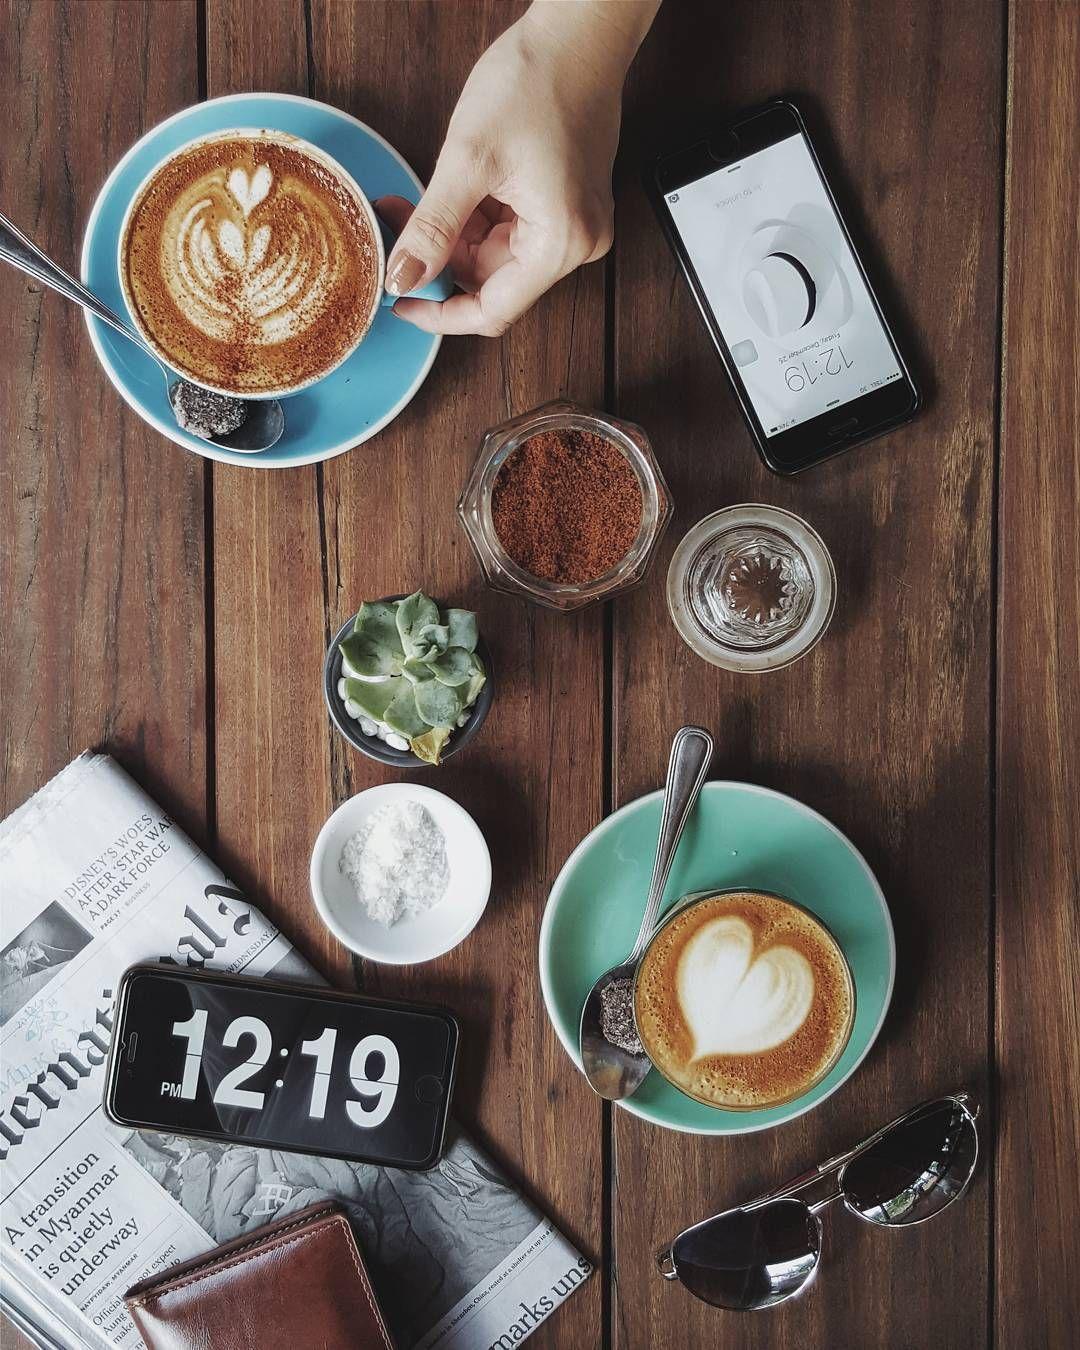 ClockAndCoffee Photo Contest Capturing clock and coffee